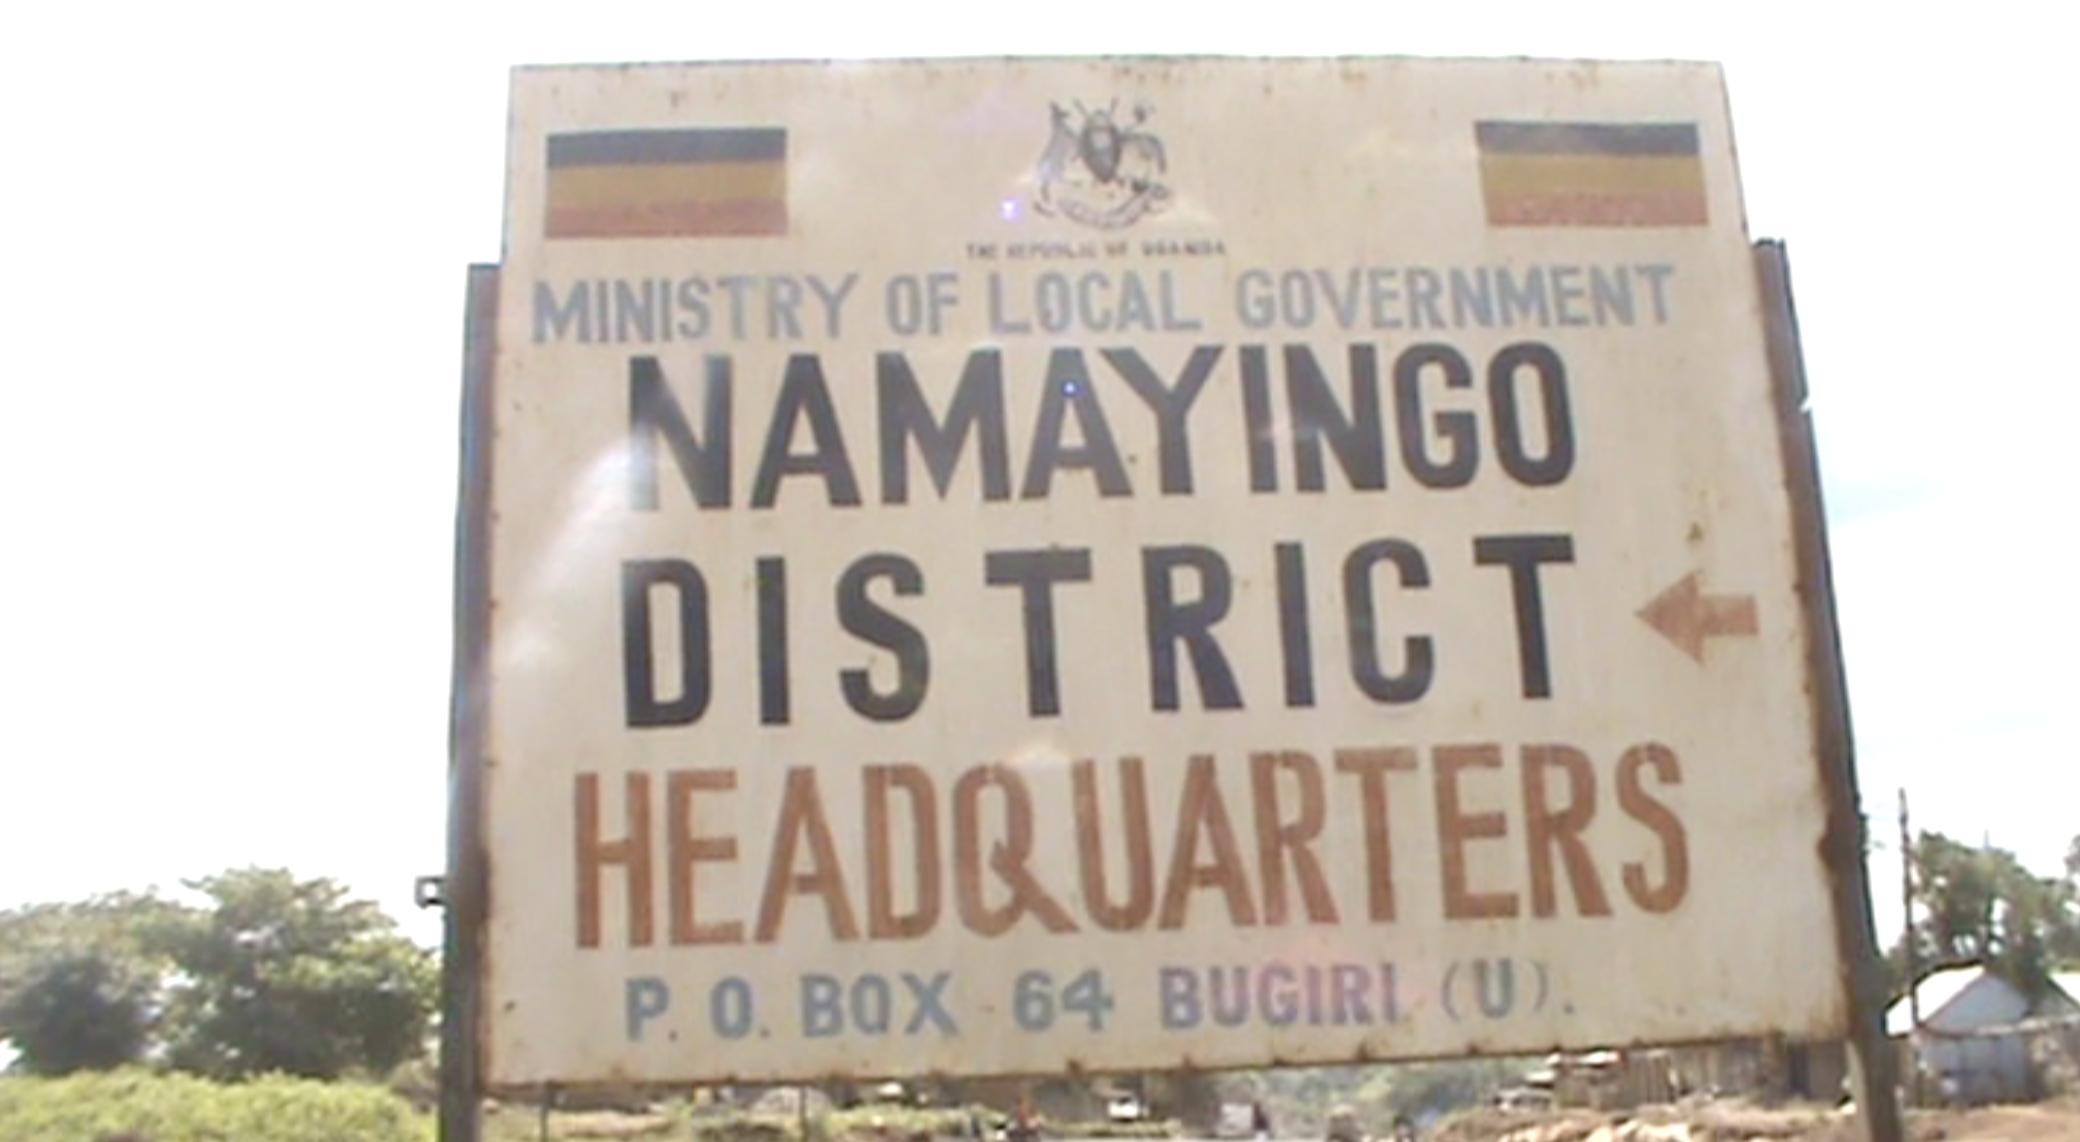 Namayingo district Head quarters